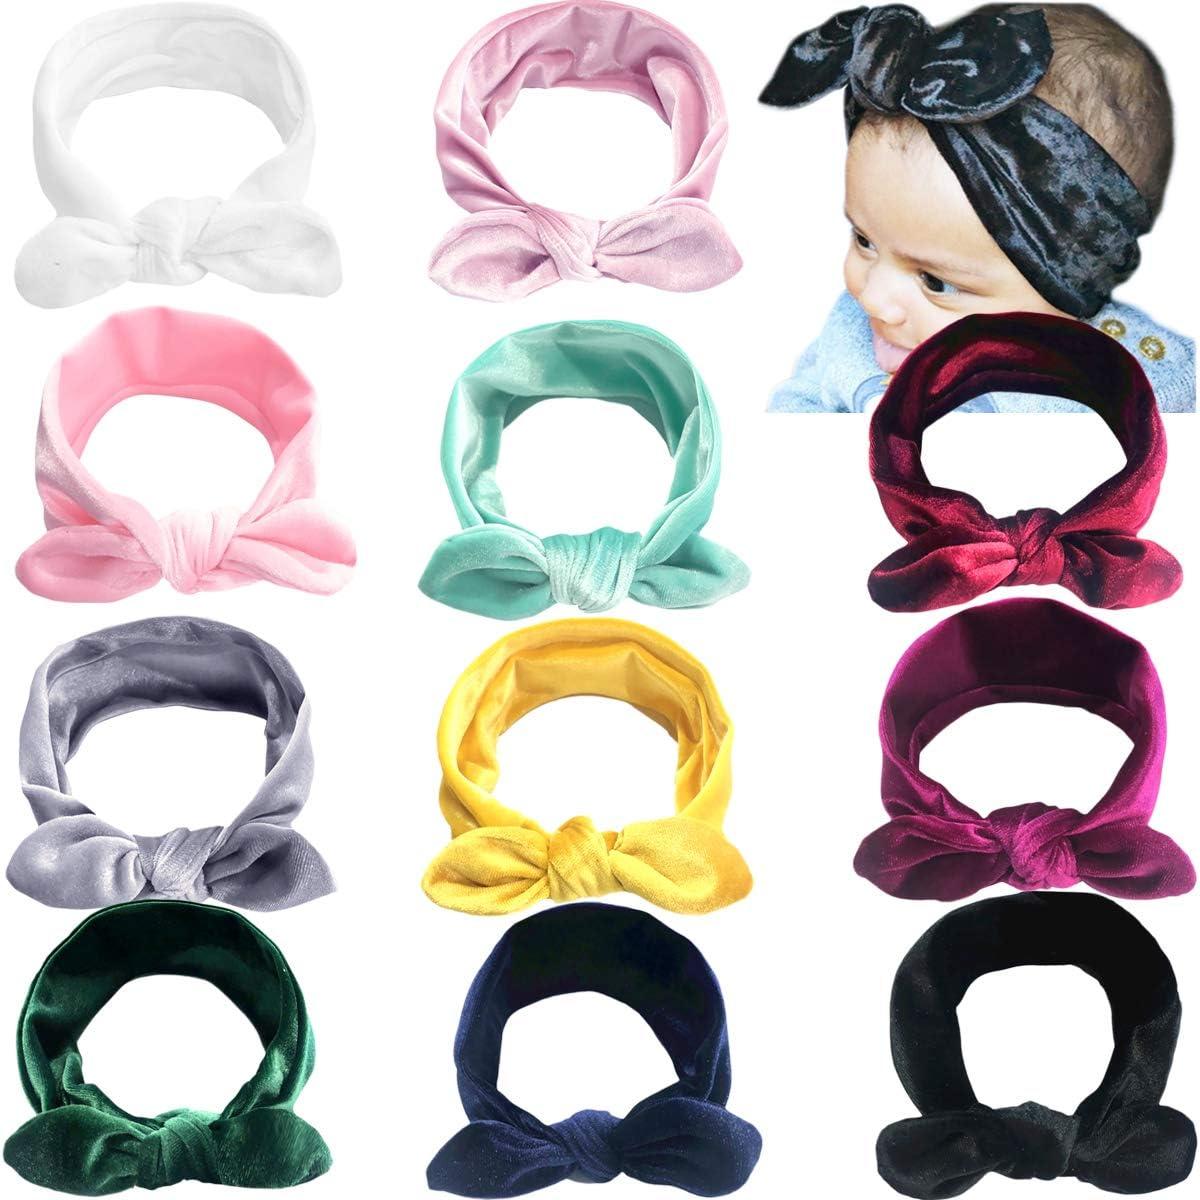 Small Velvet Baby Headband in light blue infant headbands crochet lace ivory cute pink baby headbands newborn headbands nylon headband